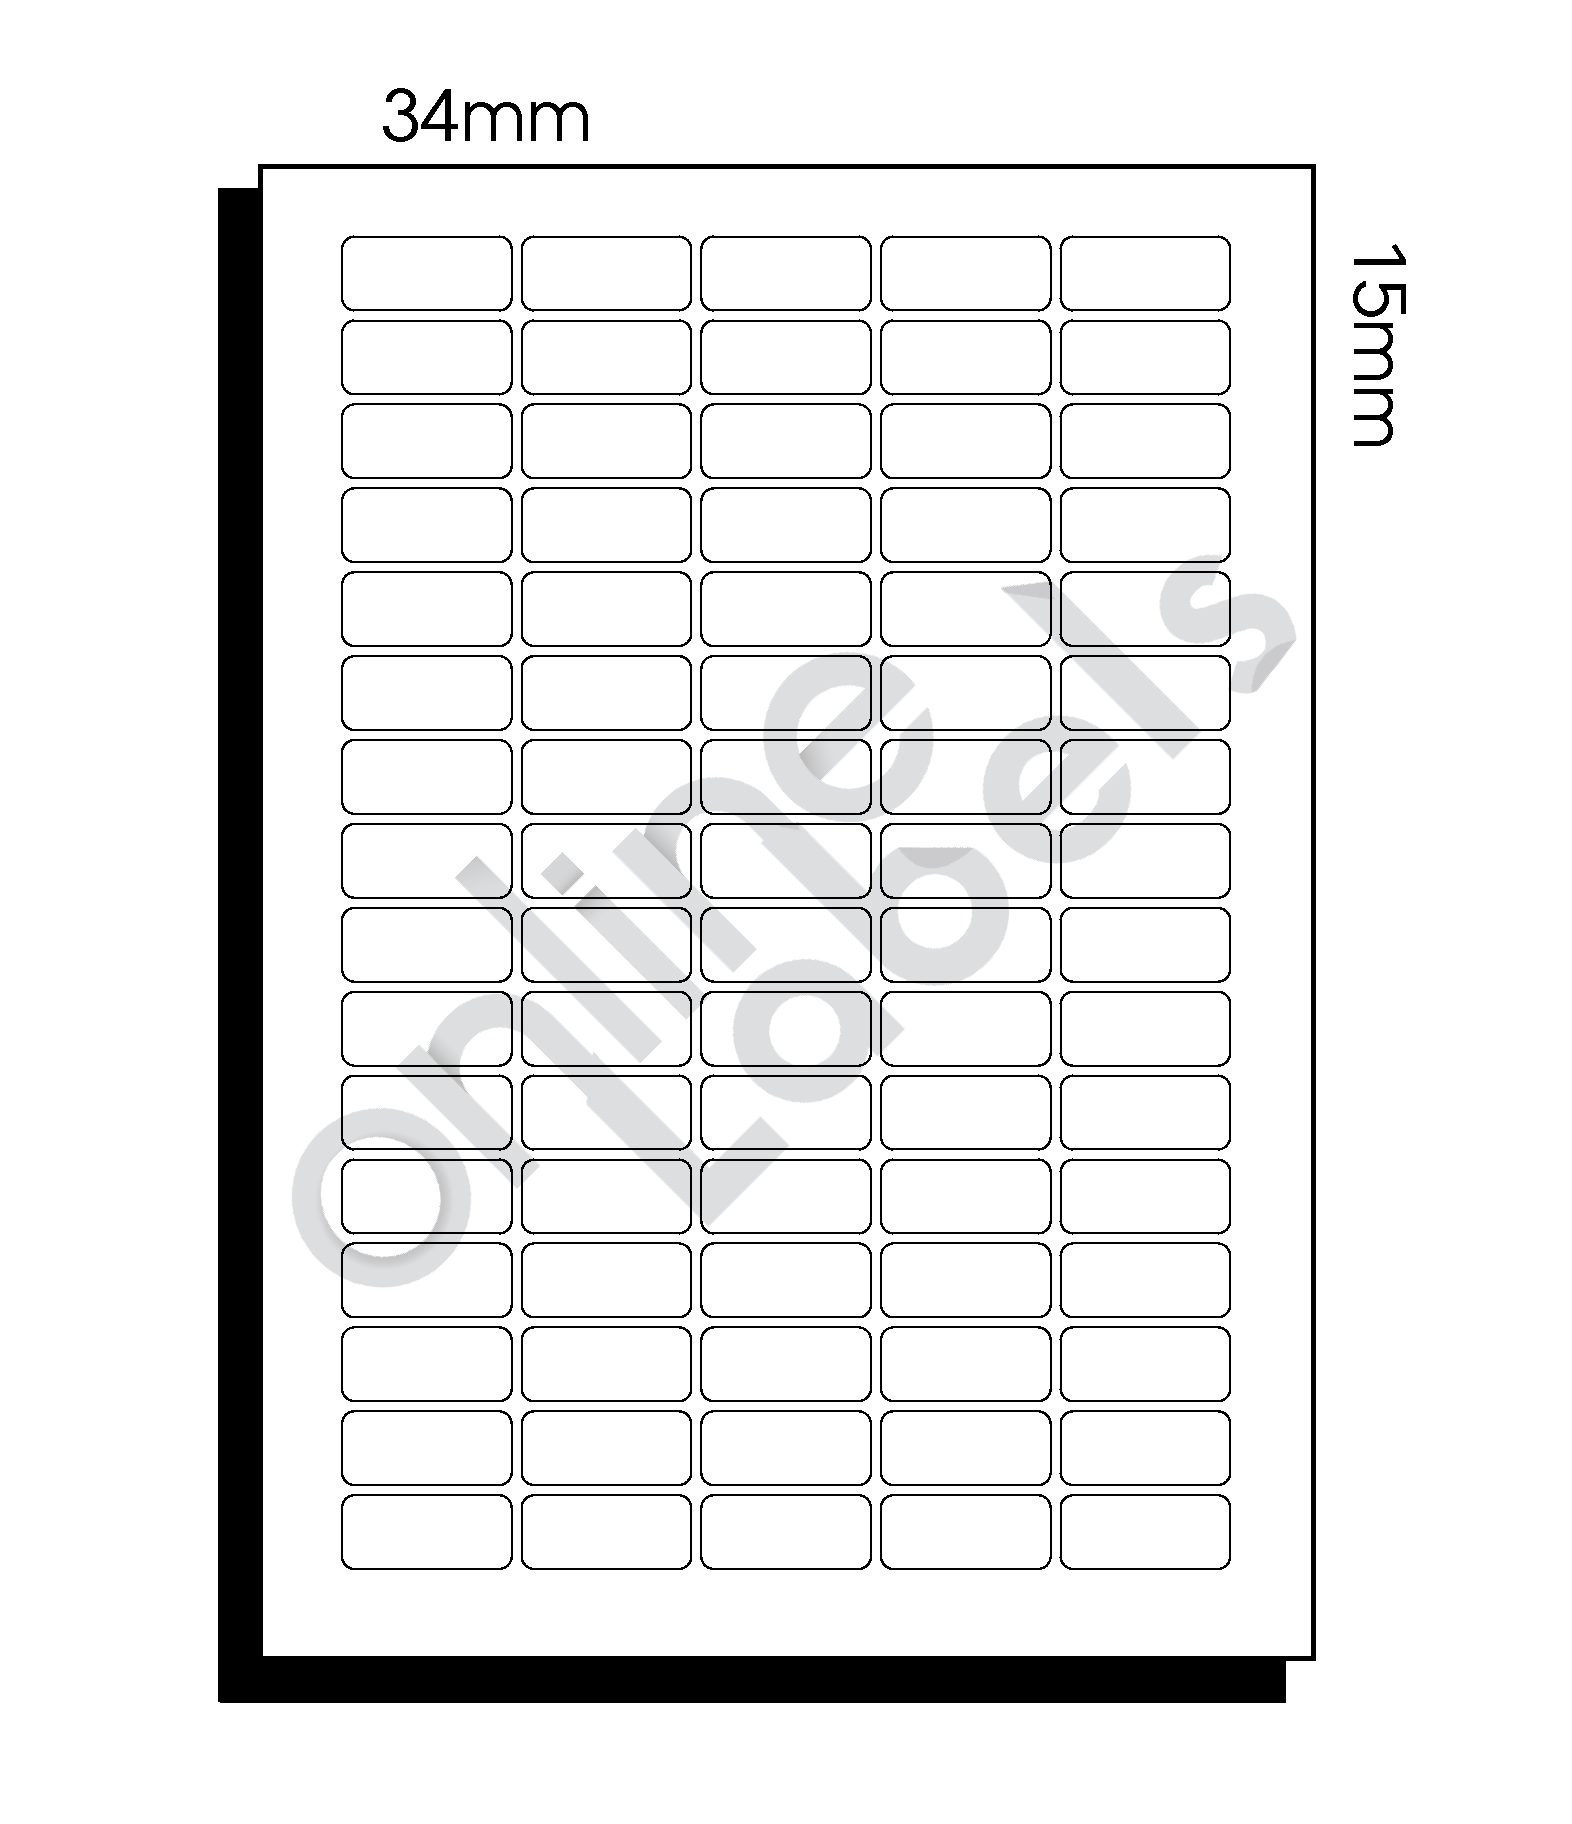 34mm x 15mm 80 labels per sheet online labels